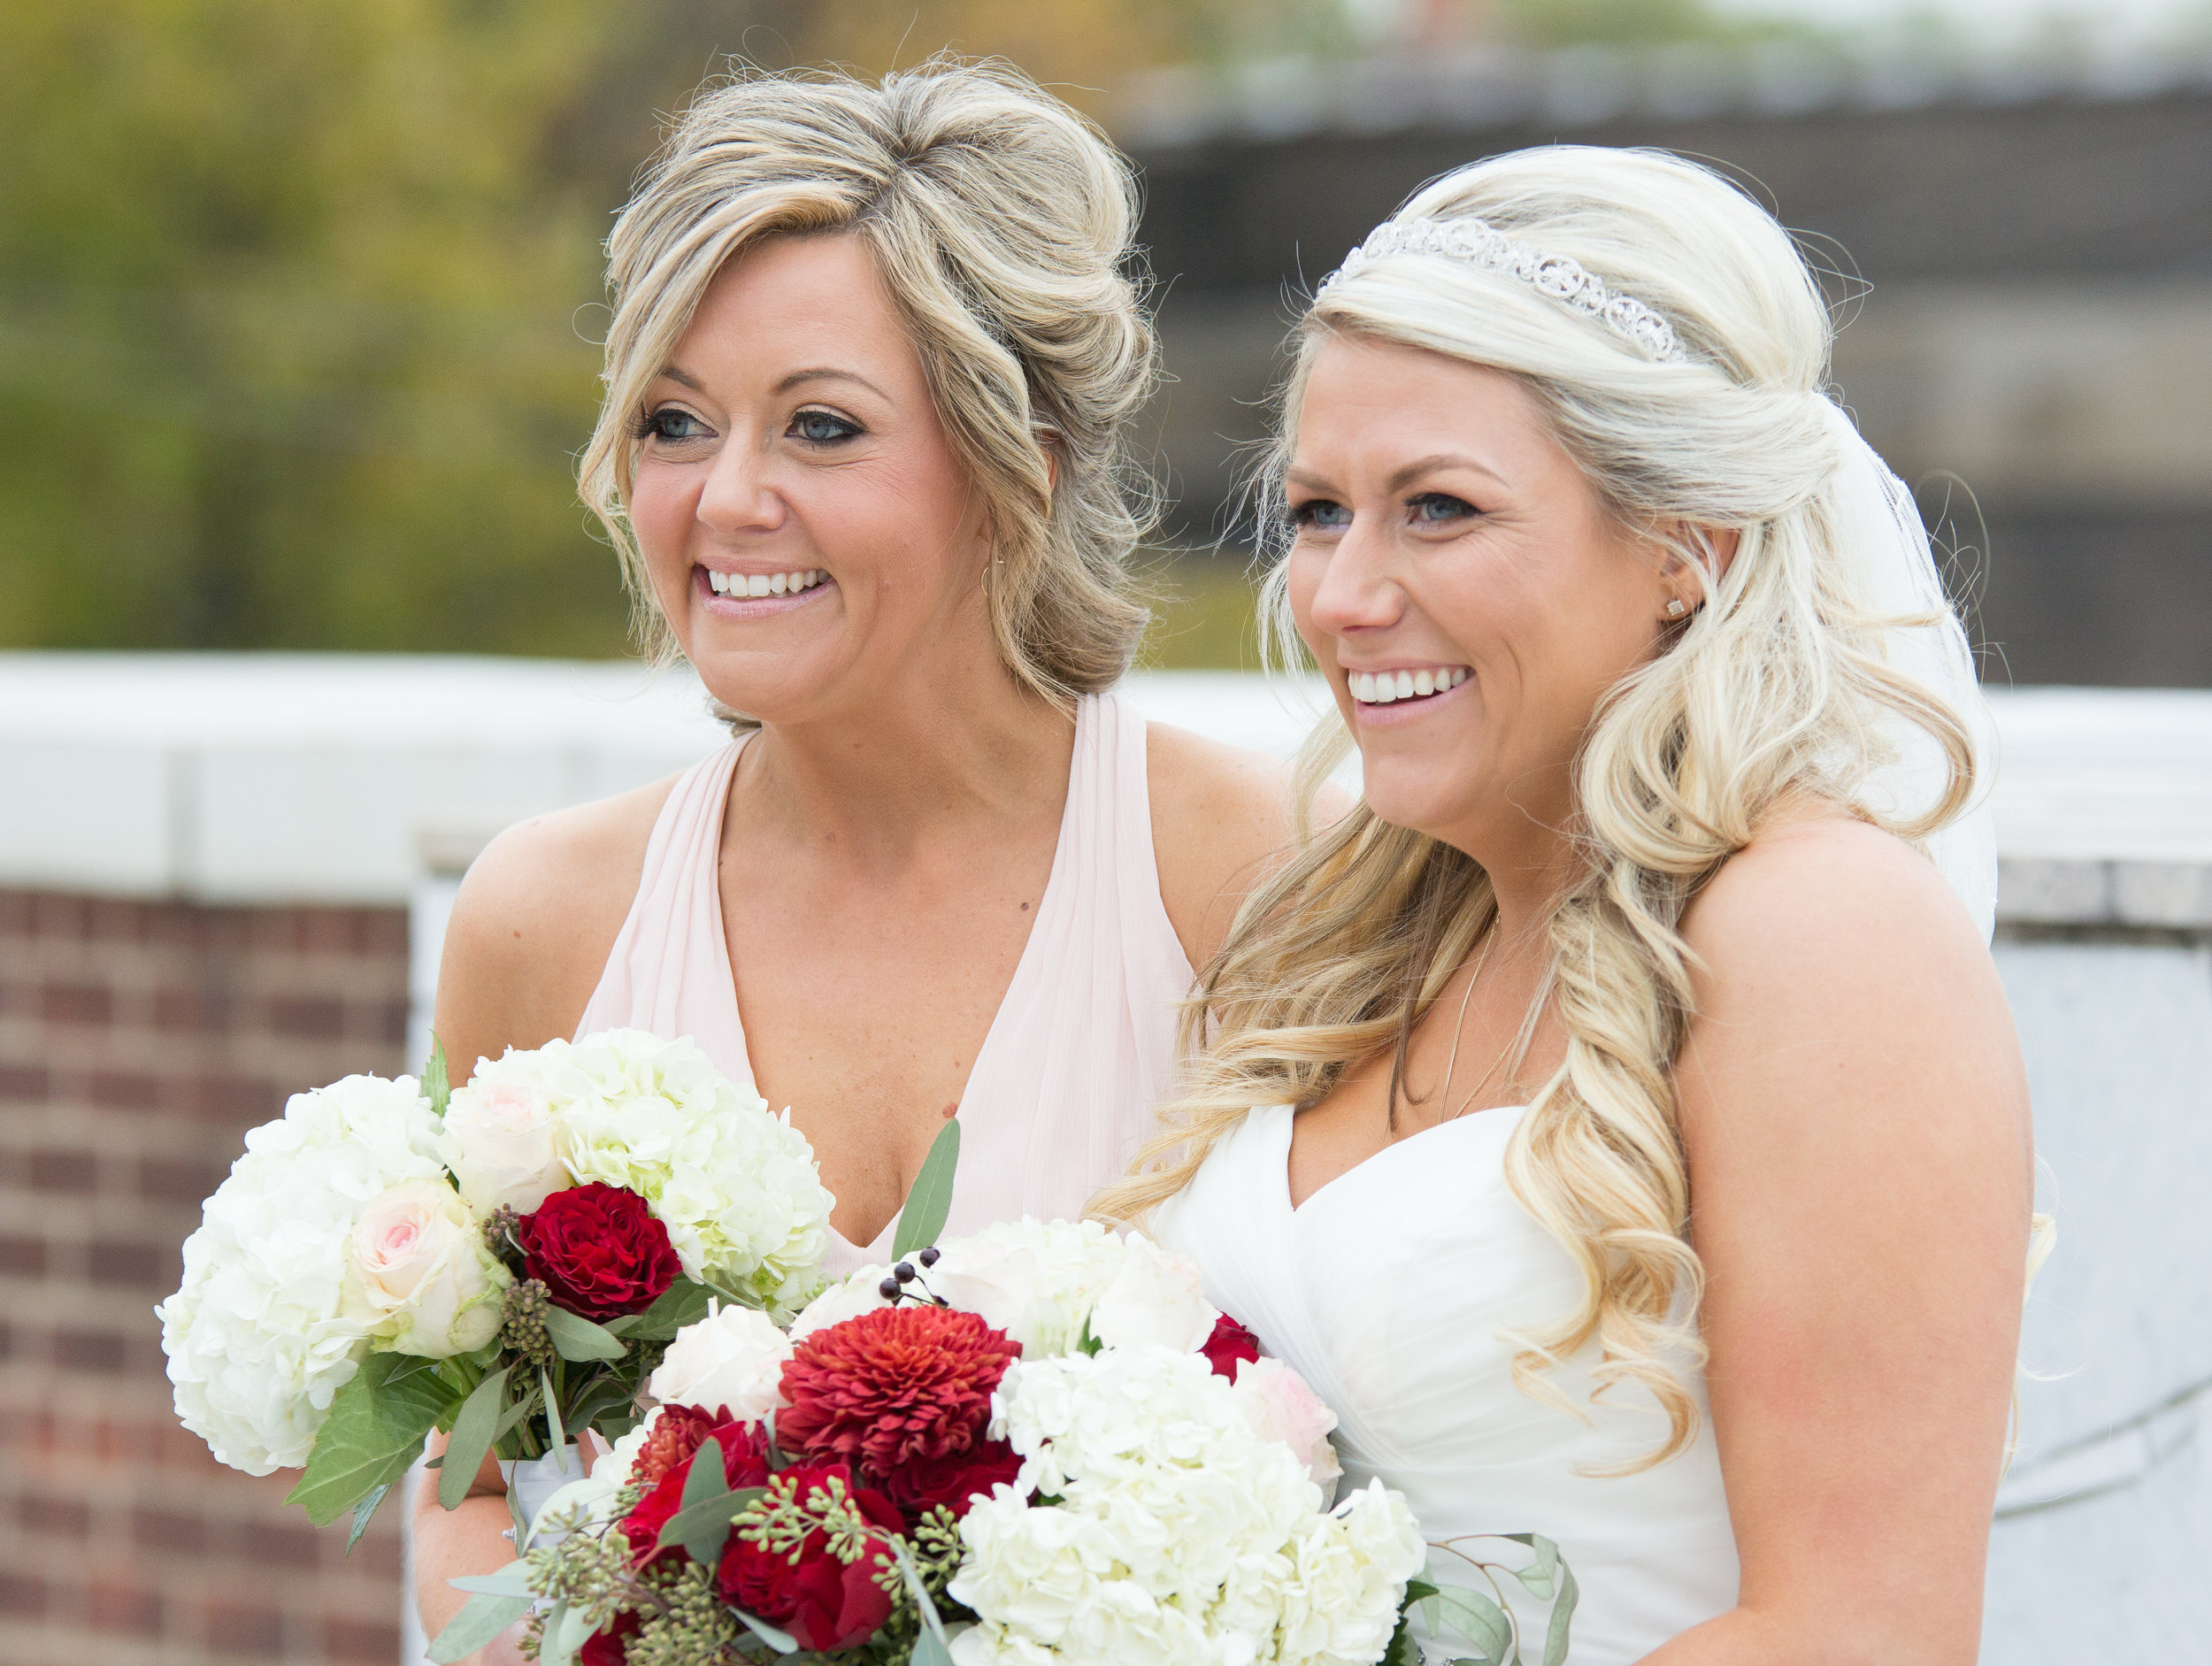 Jessica & Kurtis Wedding_10 - 20171028.jpg